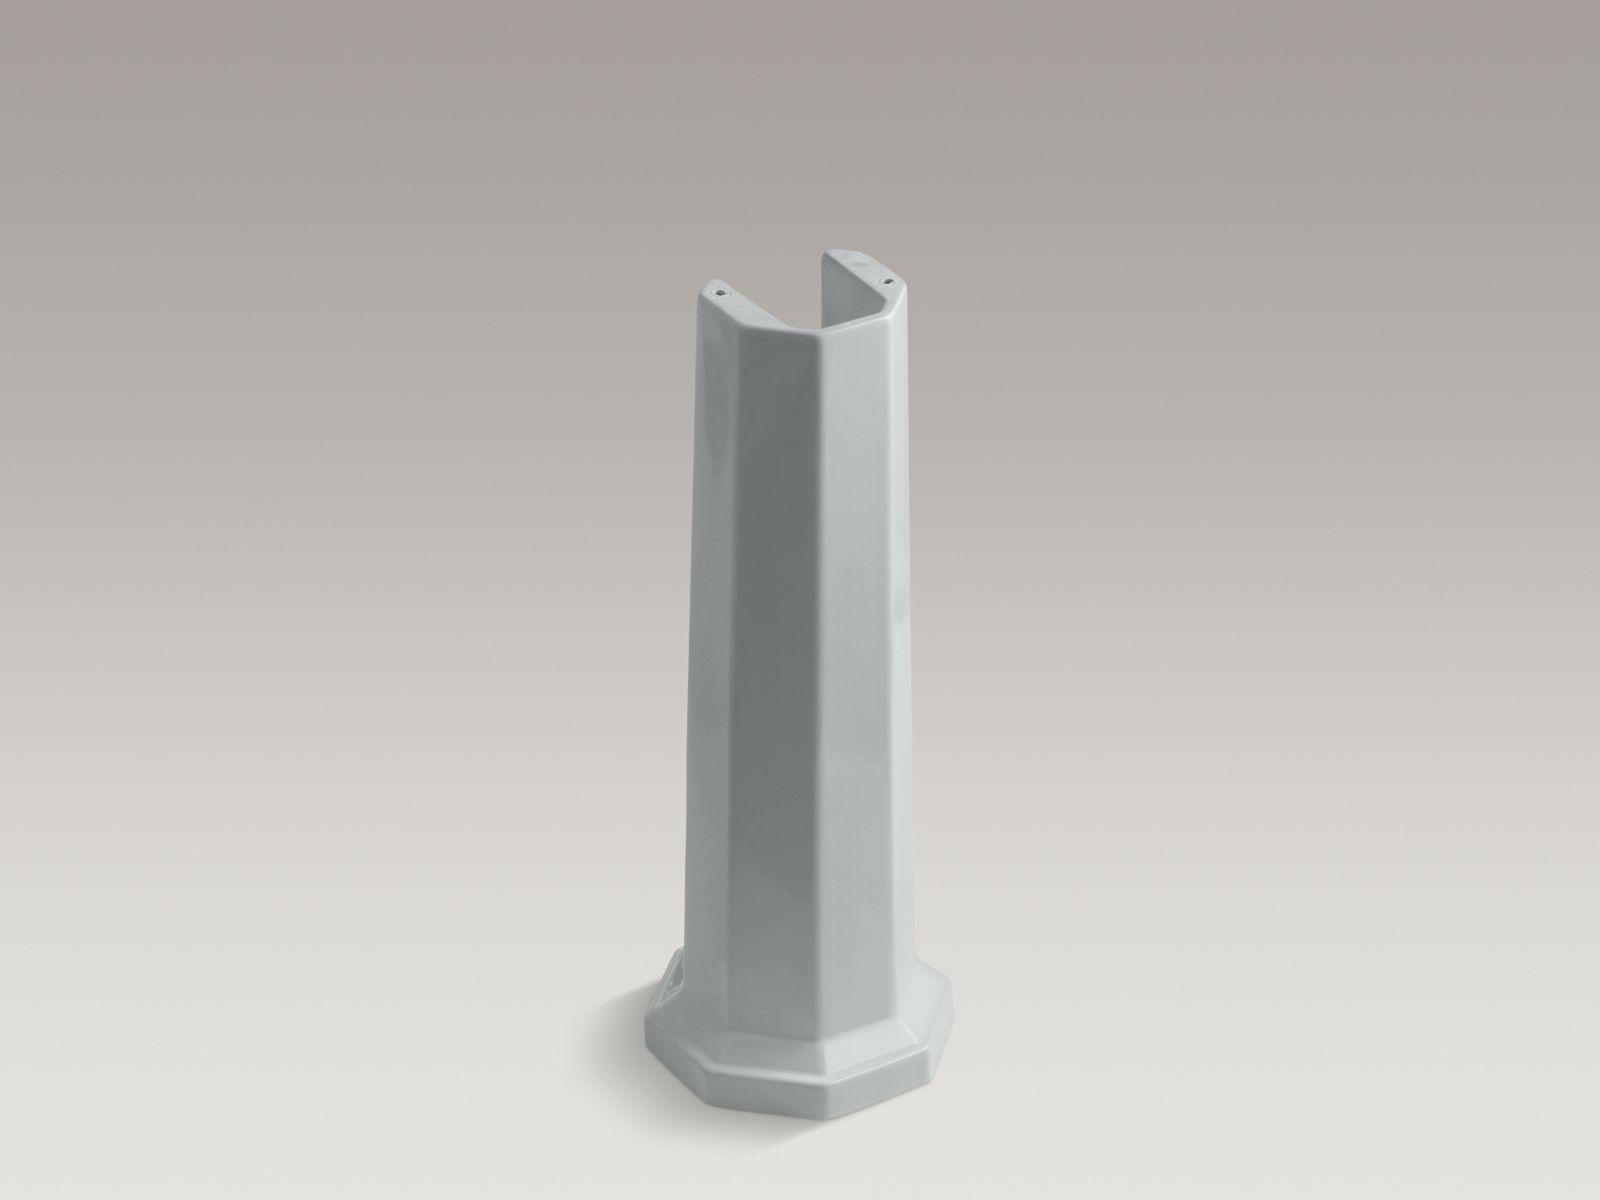 Kohler K-2324-95 Kathryn Lavatory Pedestal Ice Grey